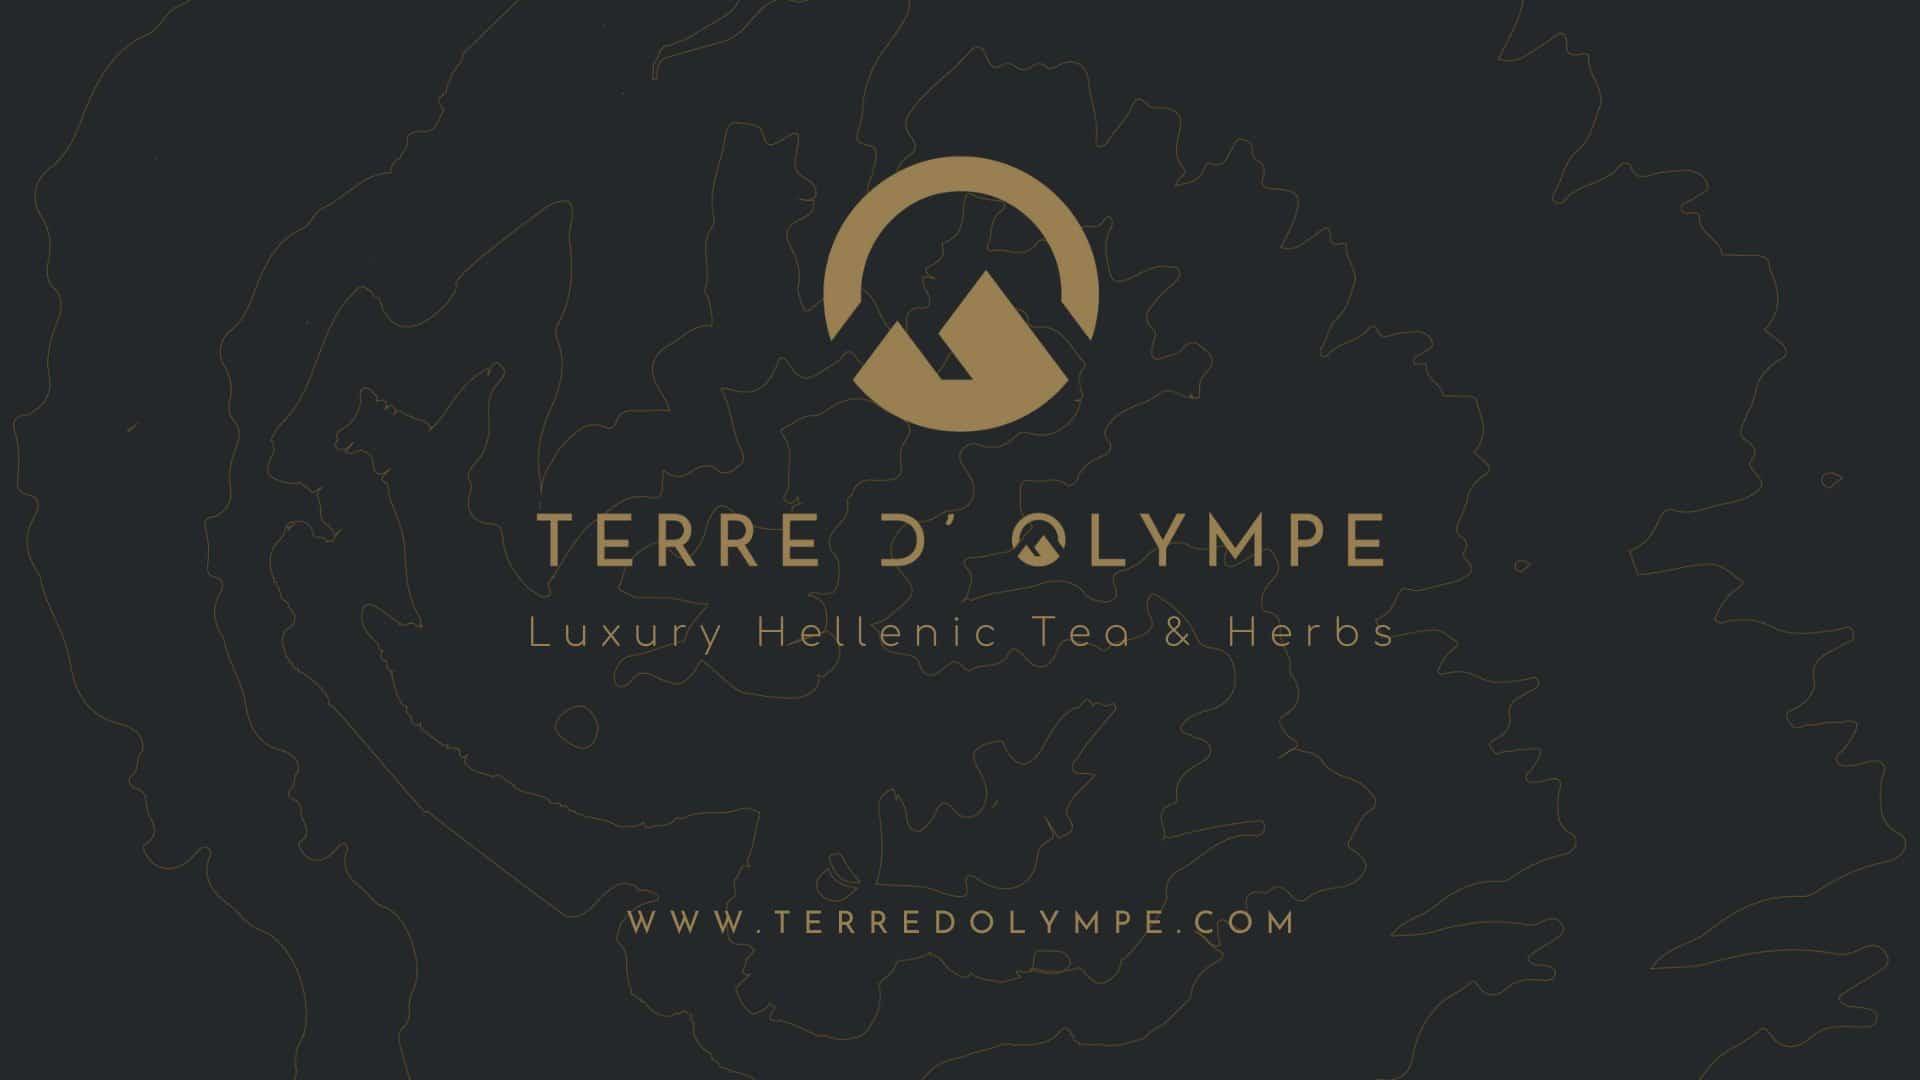 Terre D' Olympe